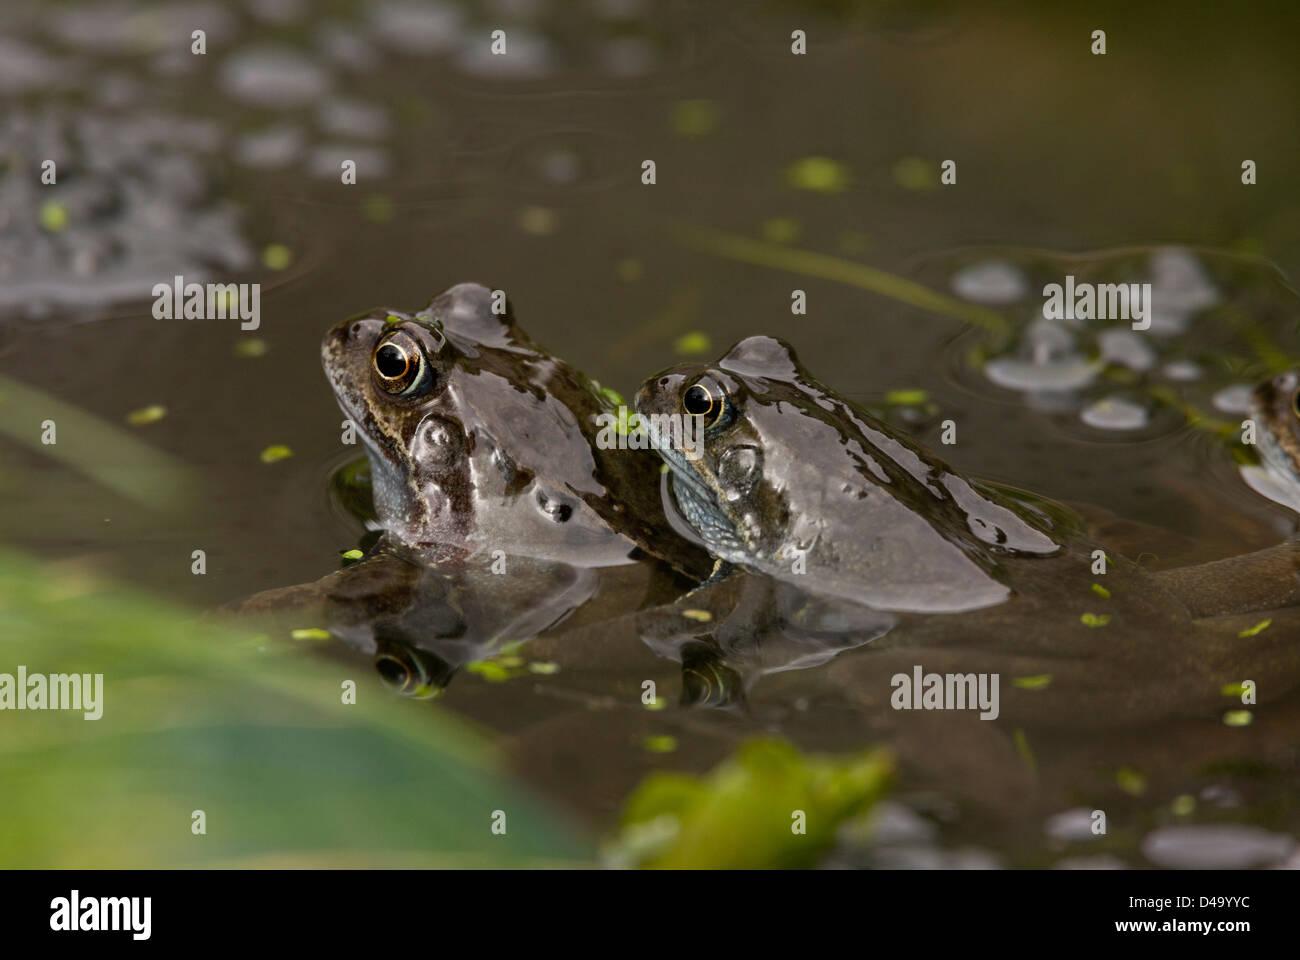 European common brown frog (Rana temporaria) at breeding pond in the mating season, close-up; garden pond, Dorset, - Stock Image